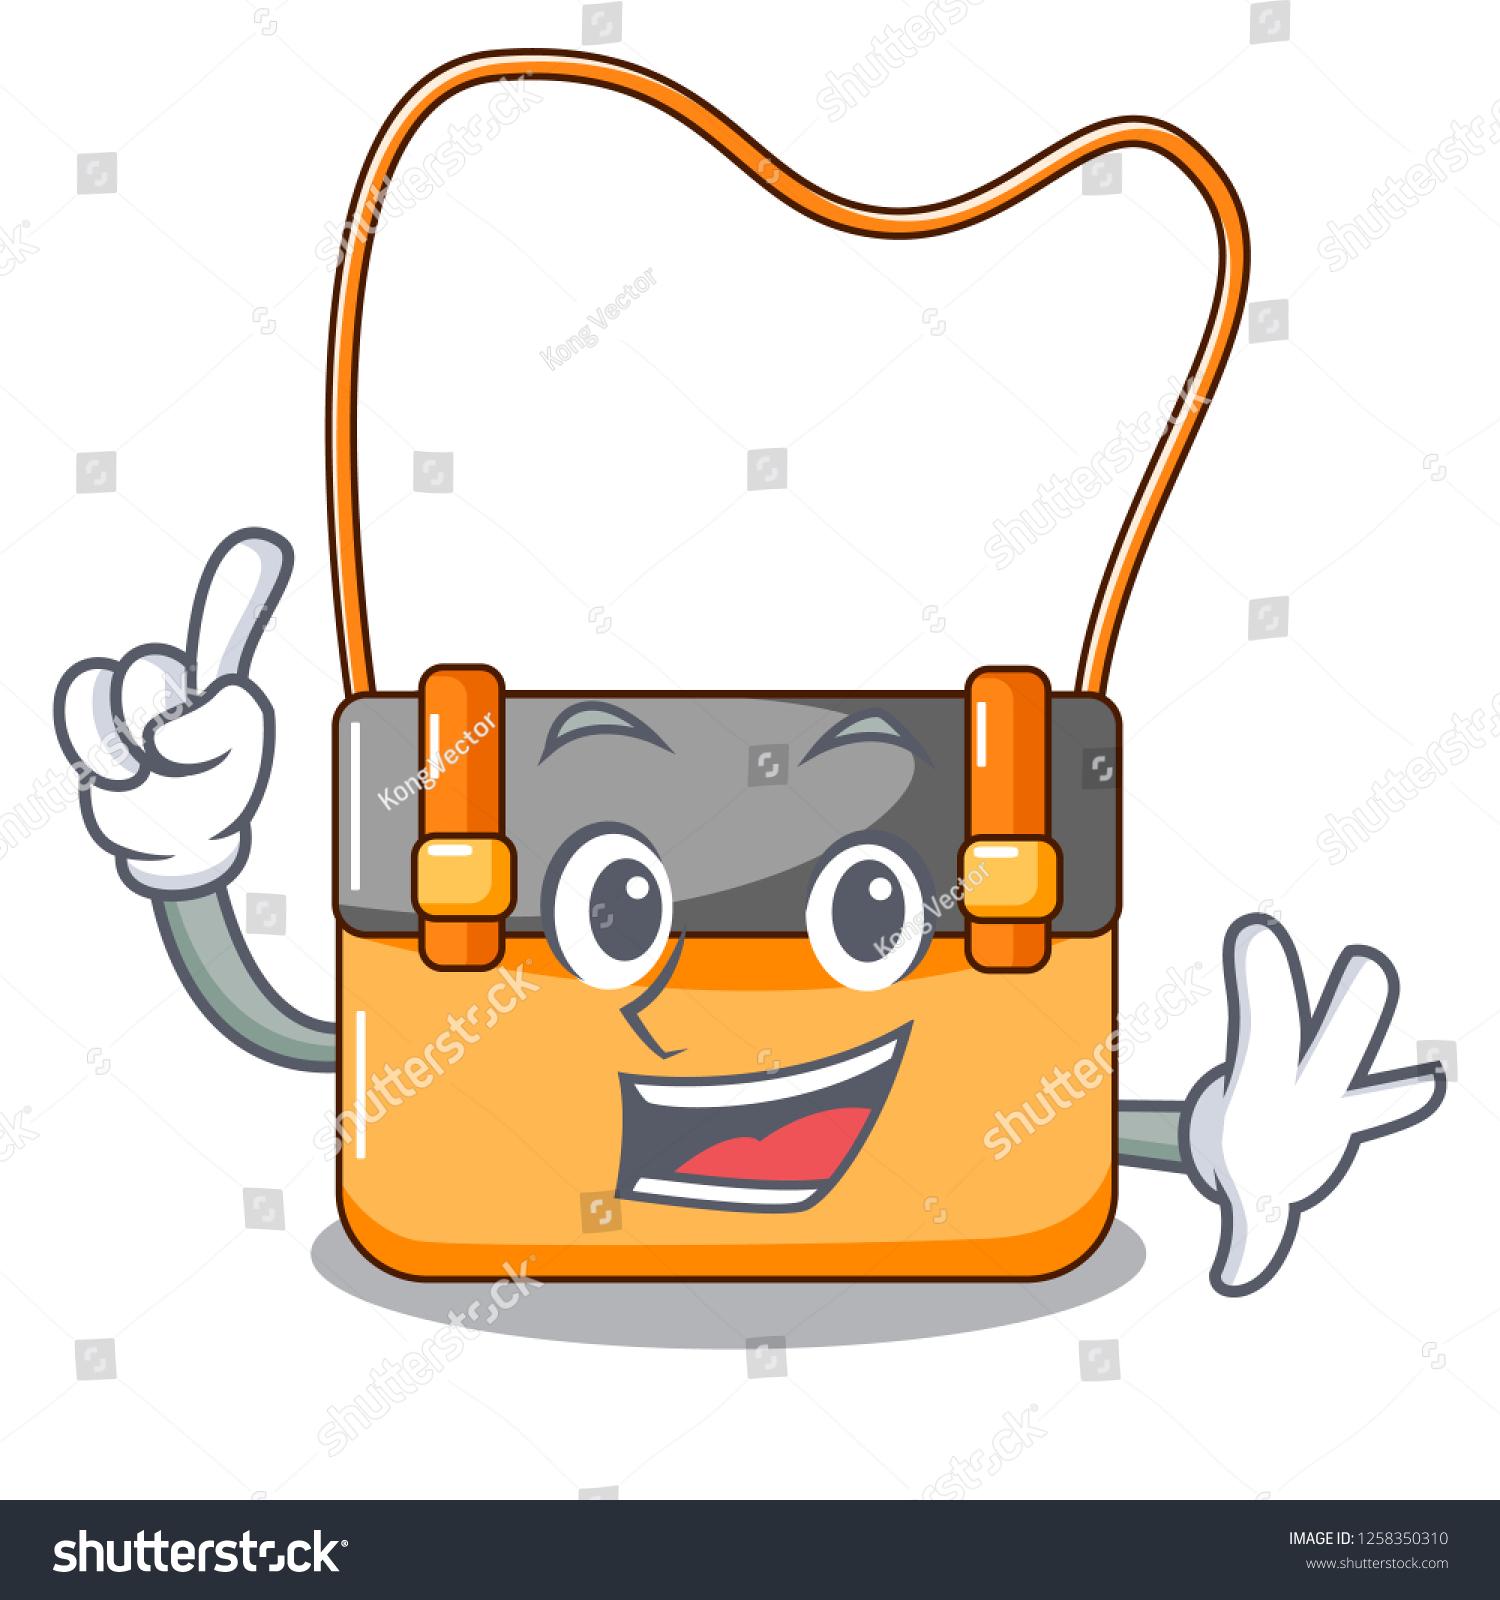 Finger Beautiful Menesengger Bag Fashion Caratoon Stock Vector Royalty Free 1258350310